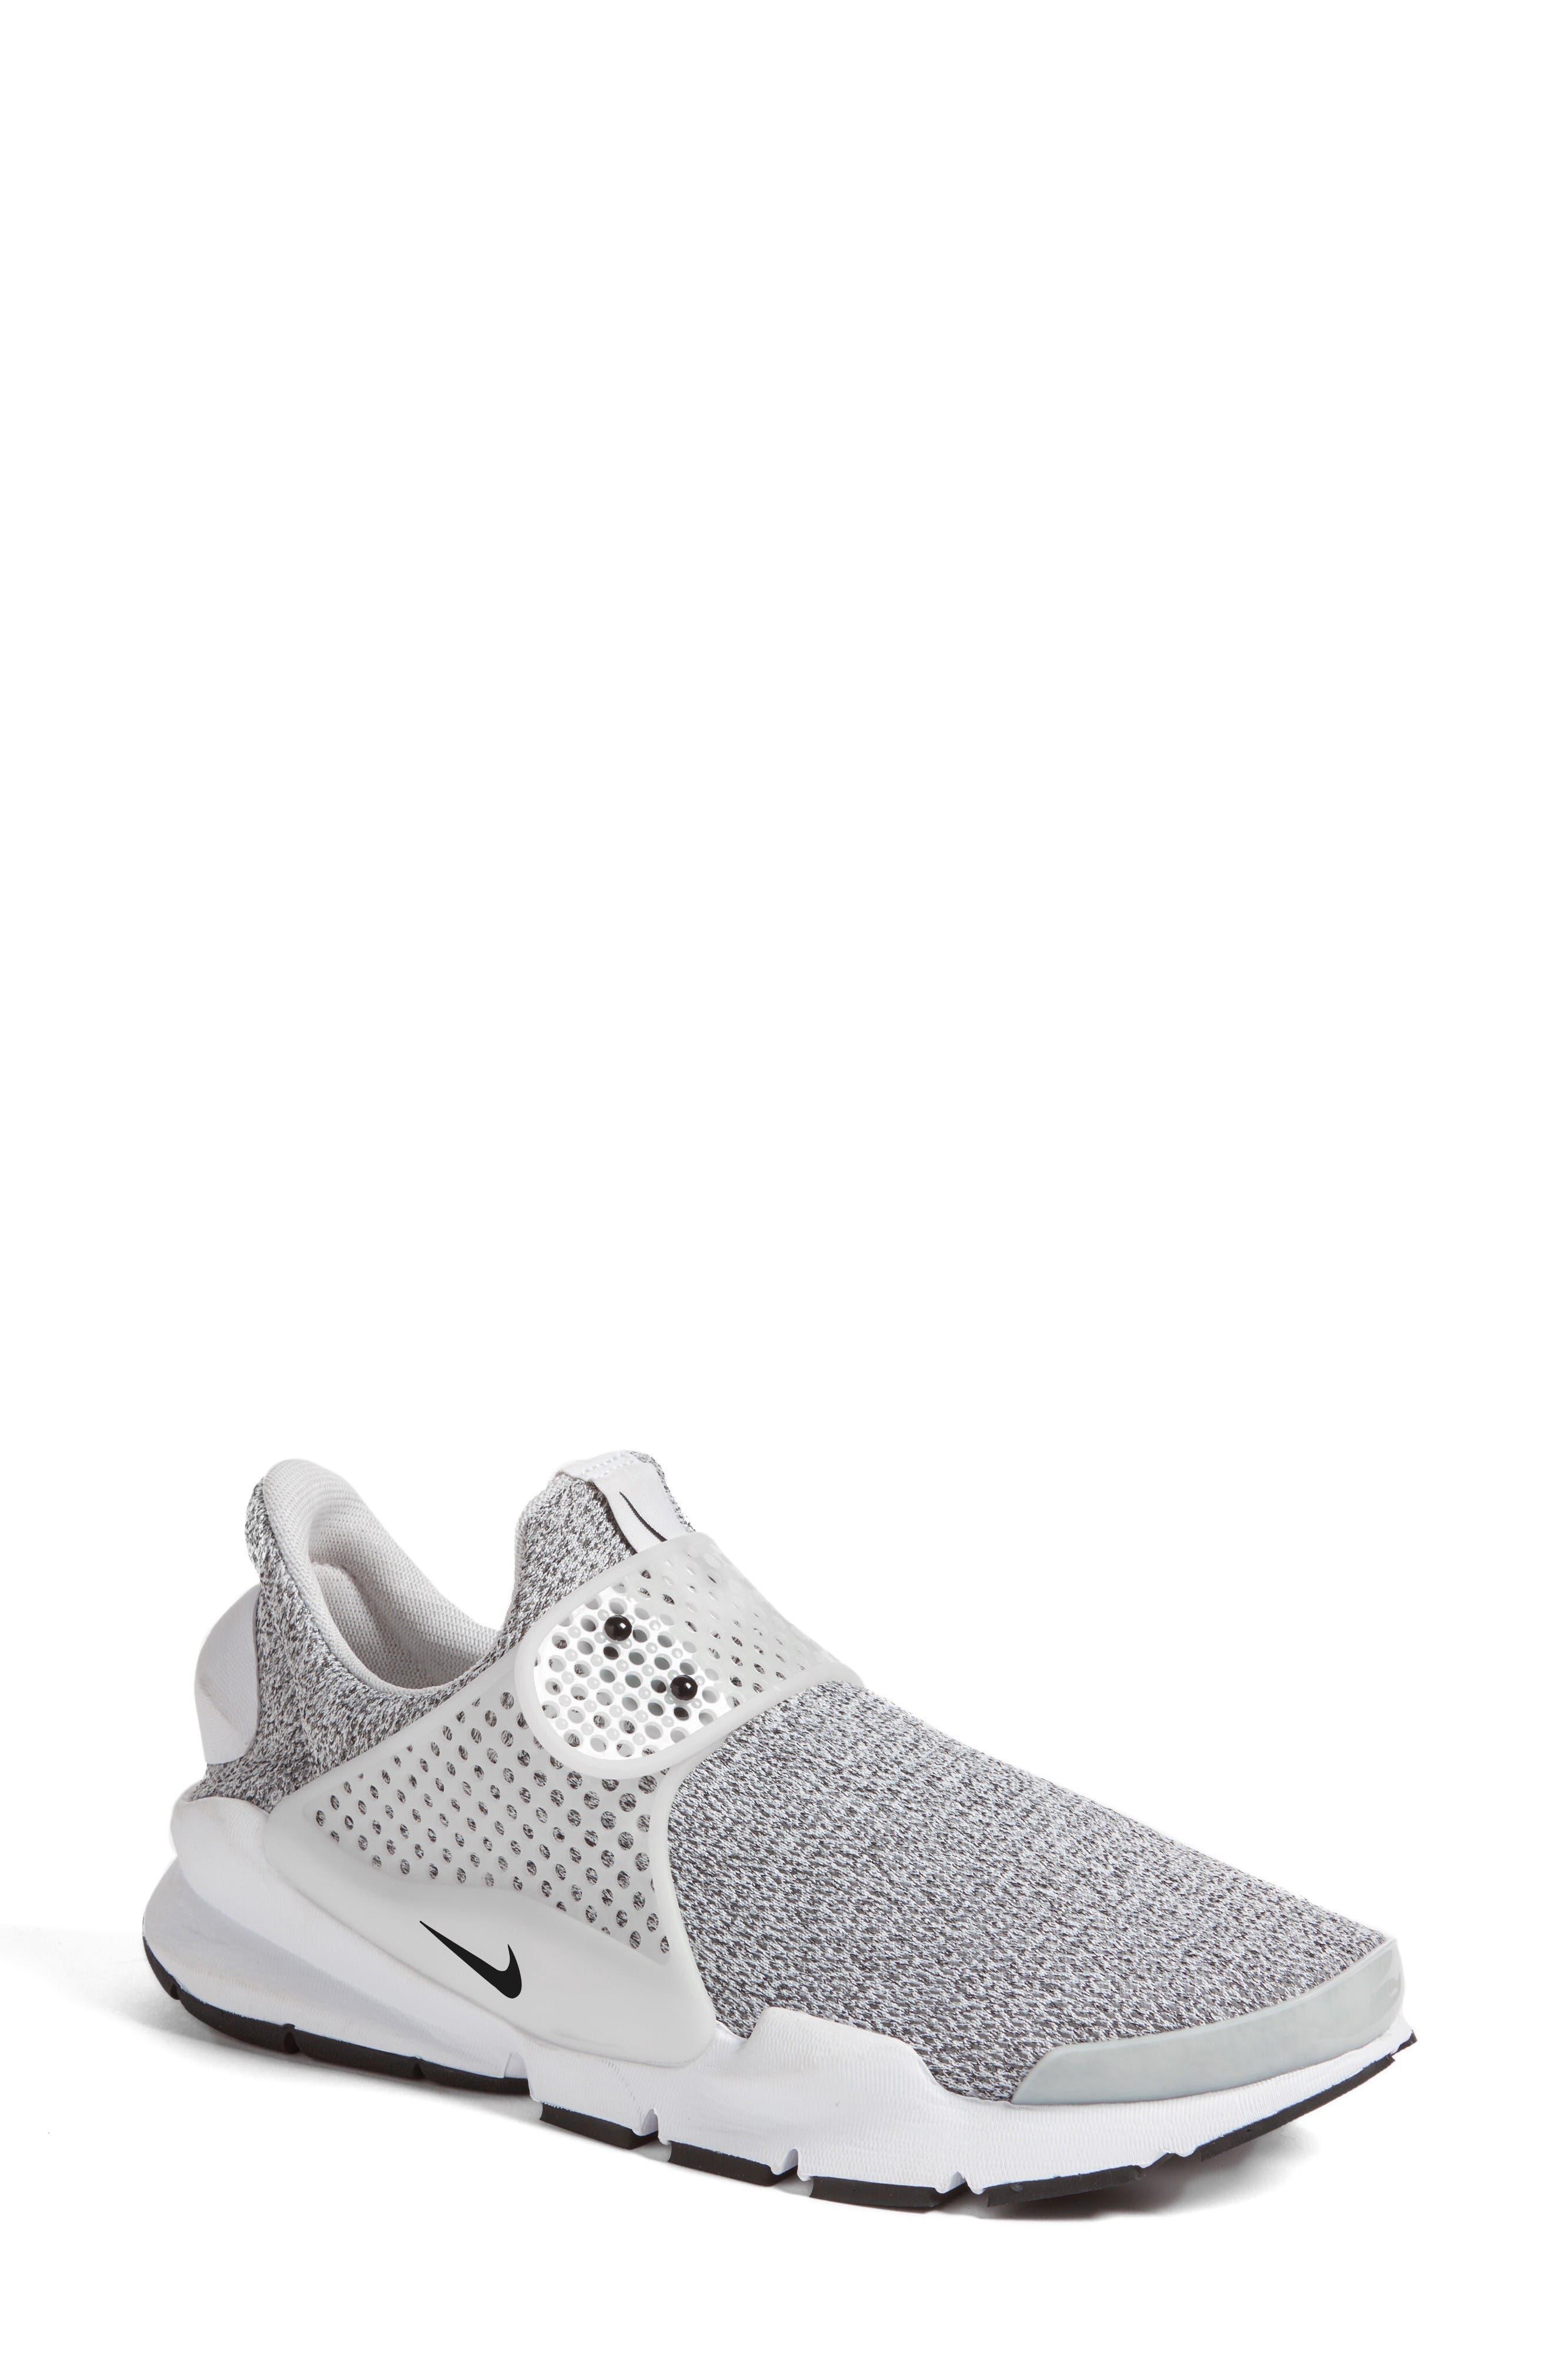 Alternate Image 1 Selected - Nike Sock Dart Sneaker (Women)